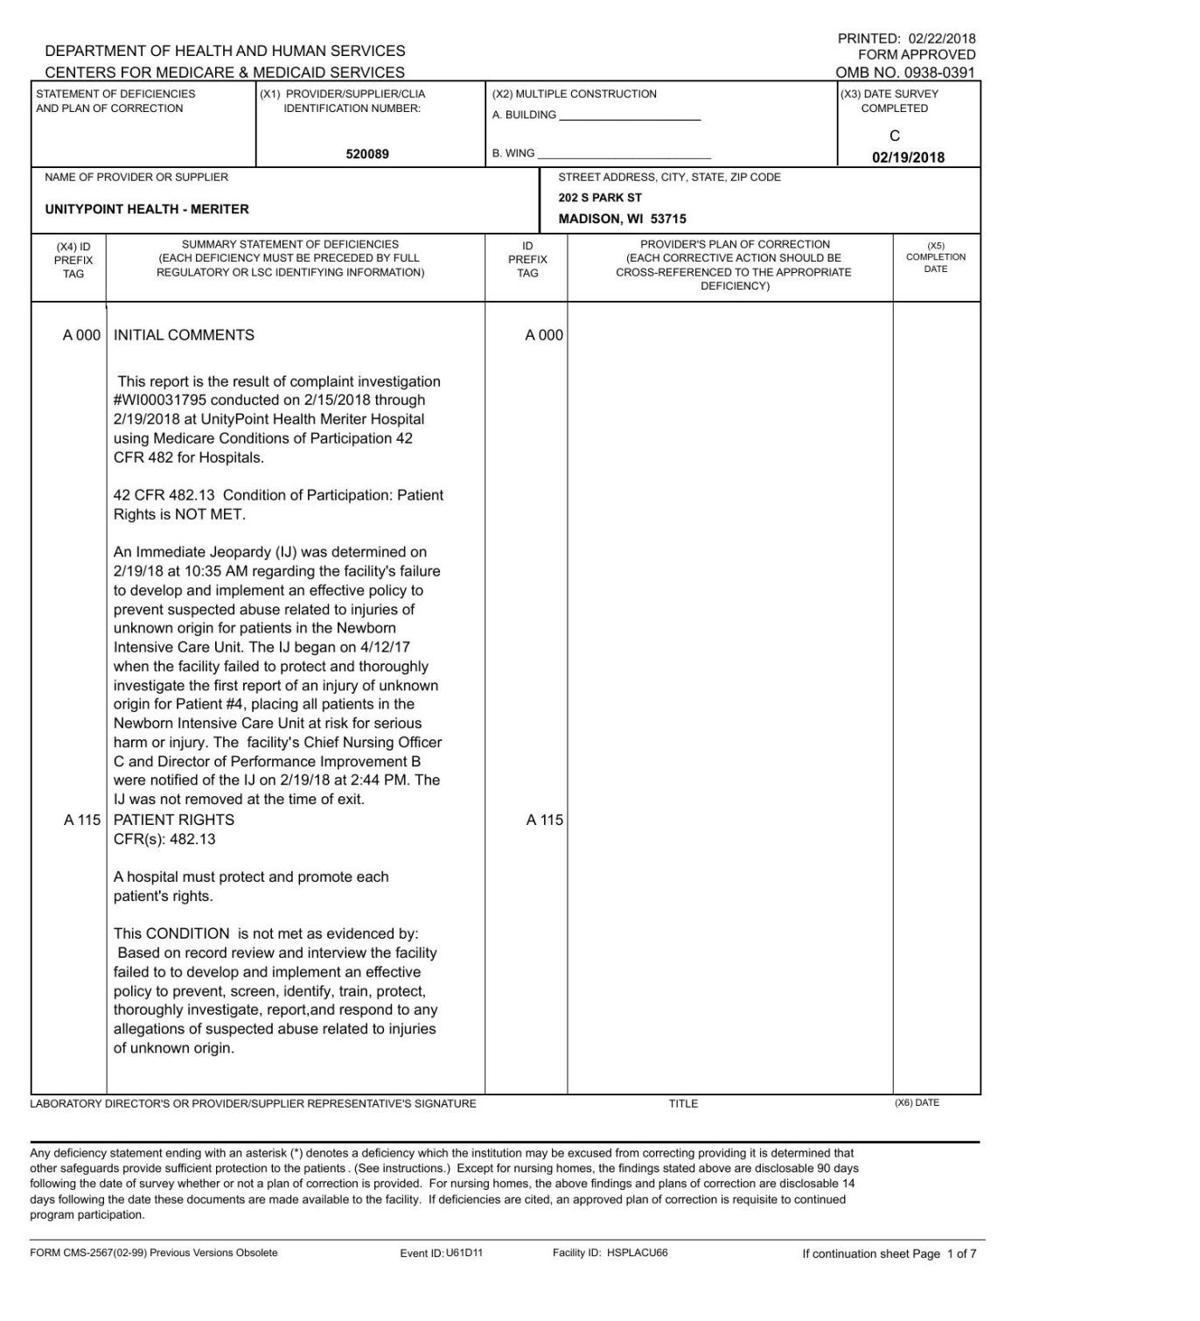 Meriter inspection report